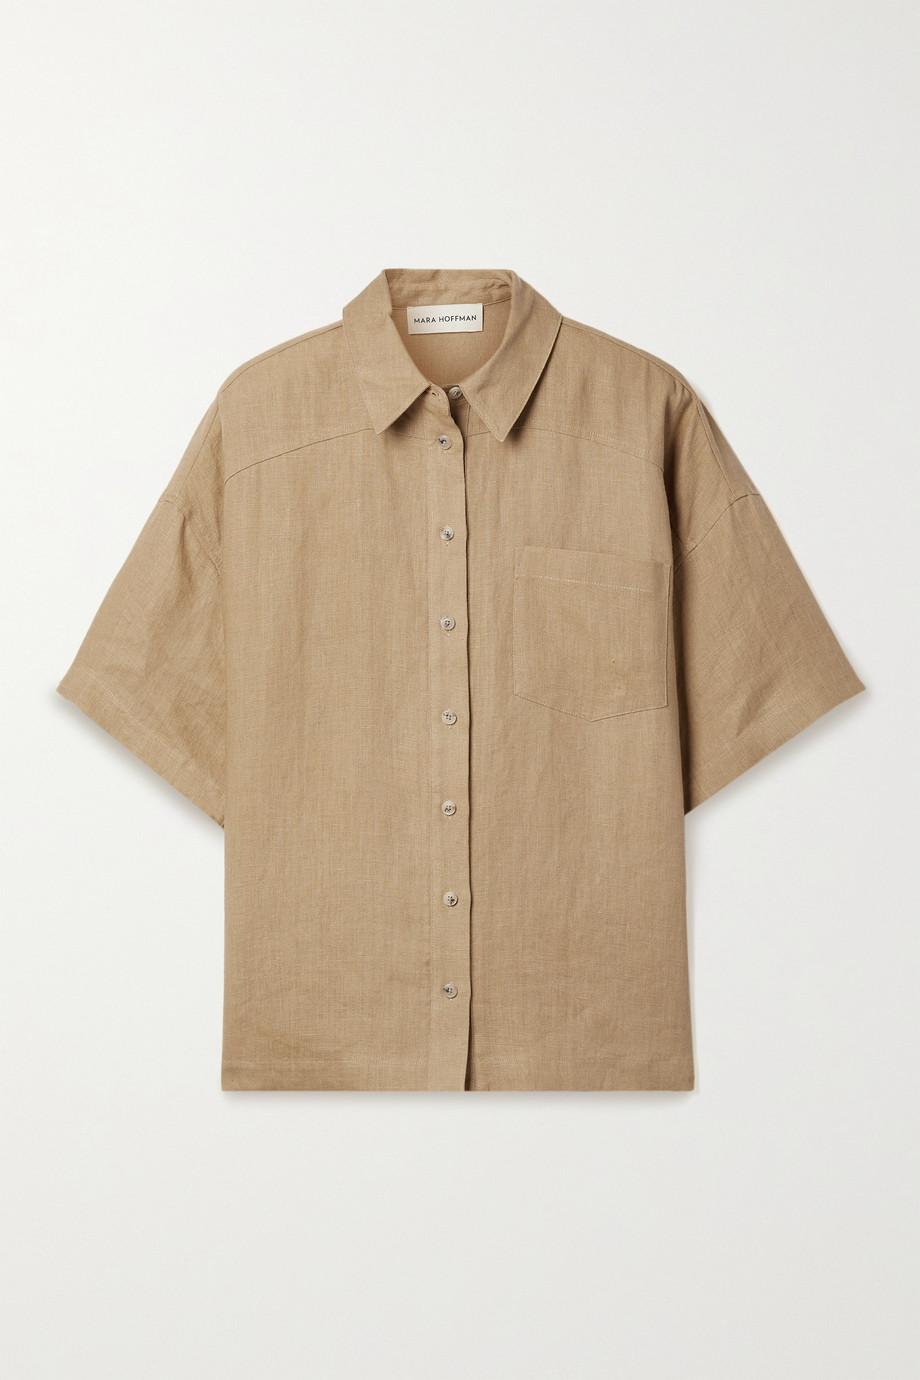 Mara Hoffman Auberon hemp shirt